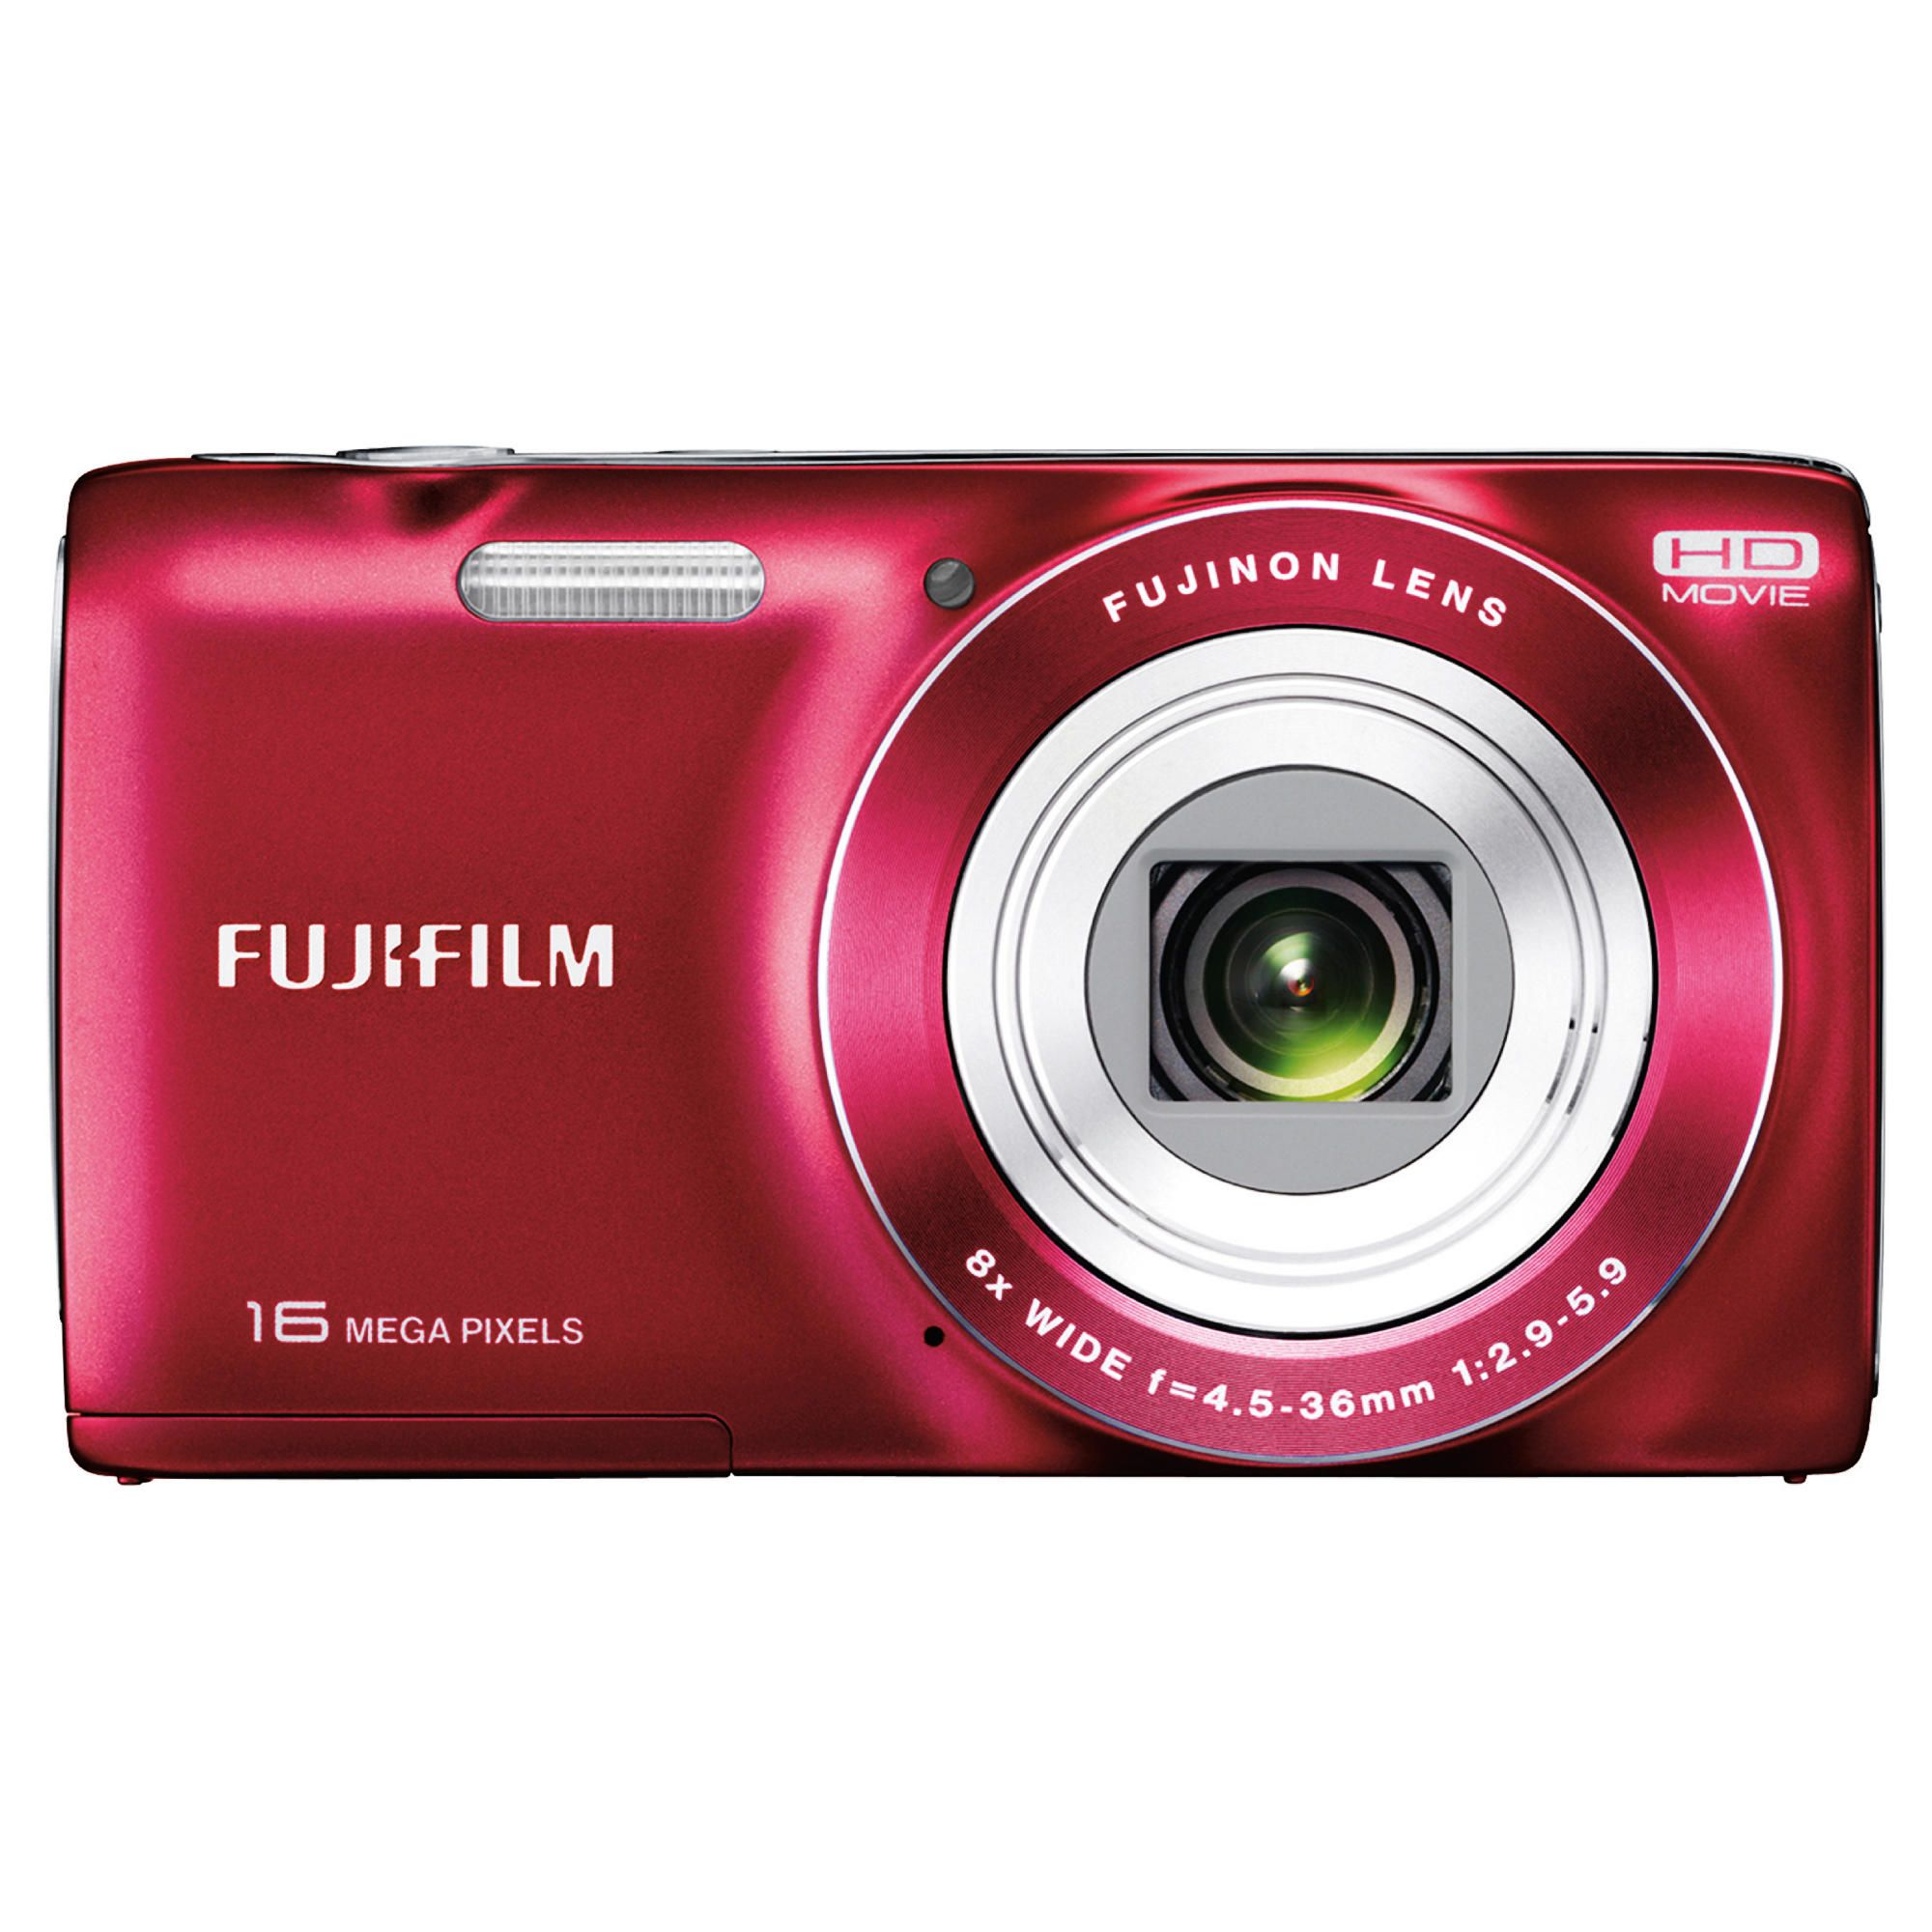 Fuji JZ200 Digital Camera, Red, 16MP, 8x Optical Zoom, 2.7 inch LCD Screen